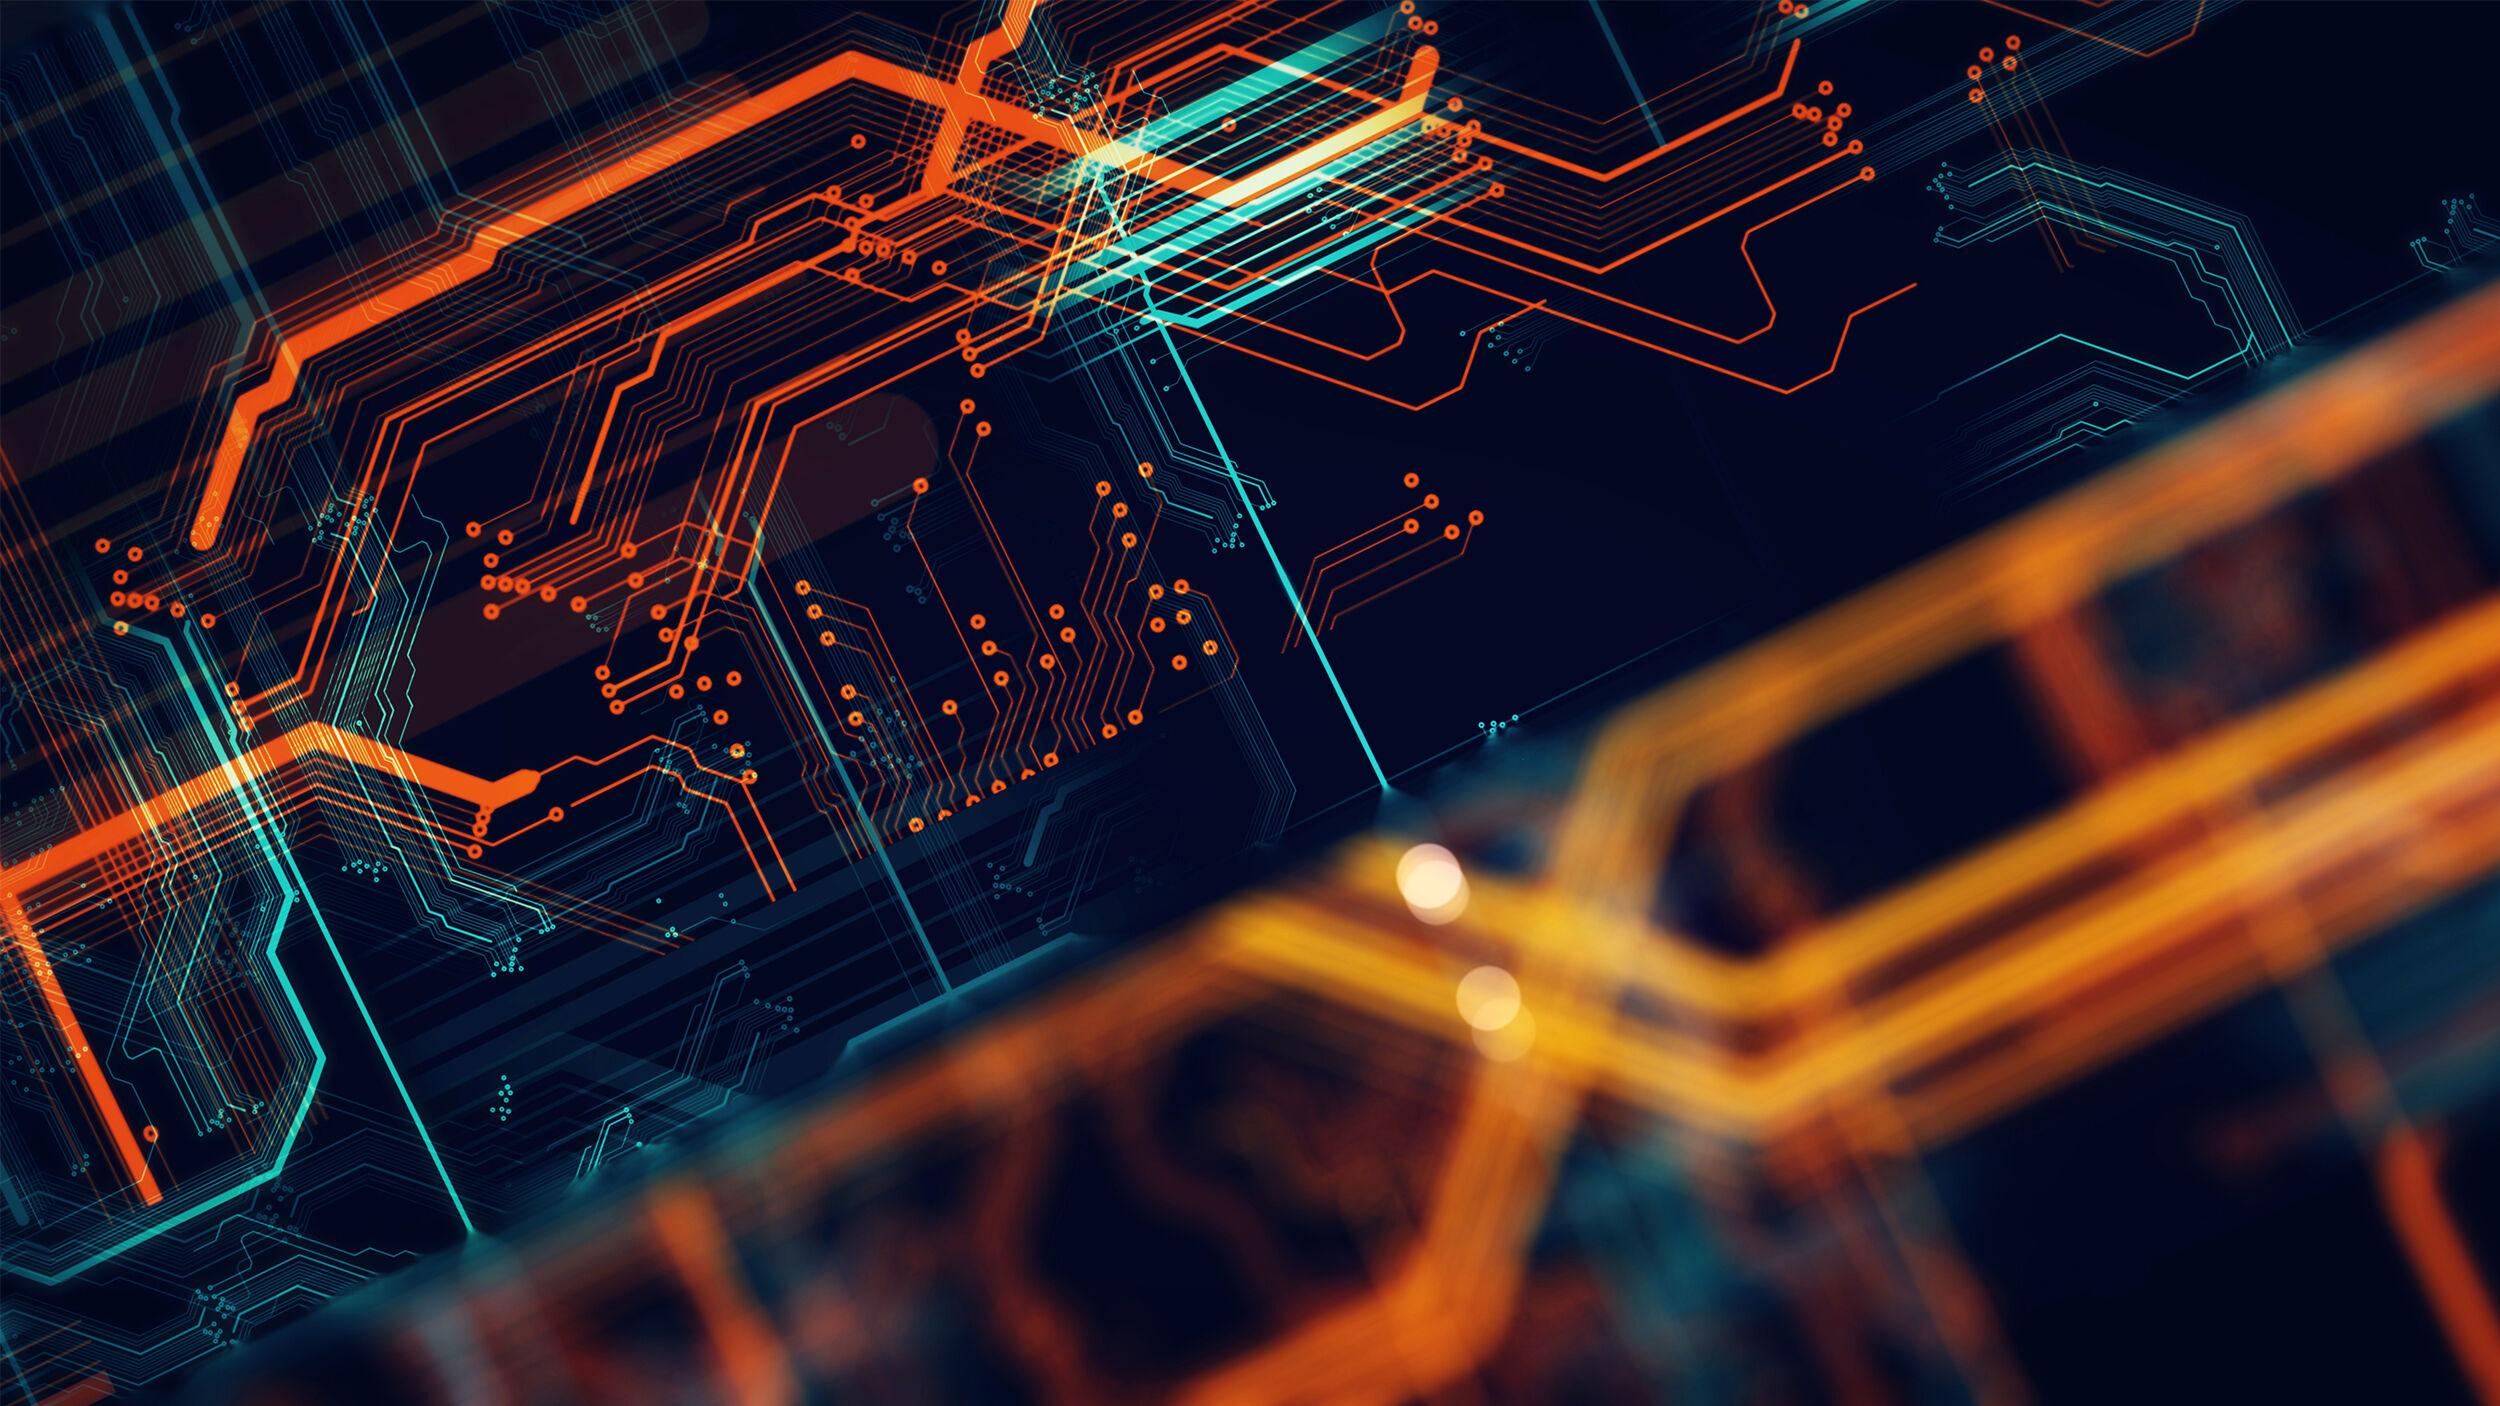 Digital gateway to open new possibilities